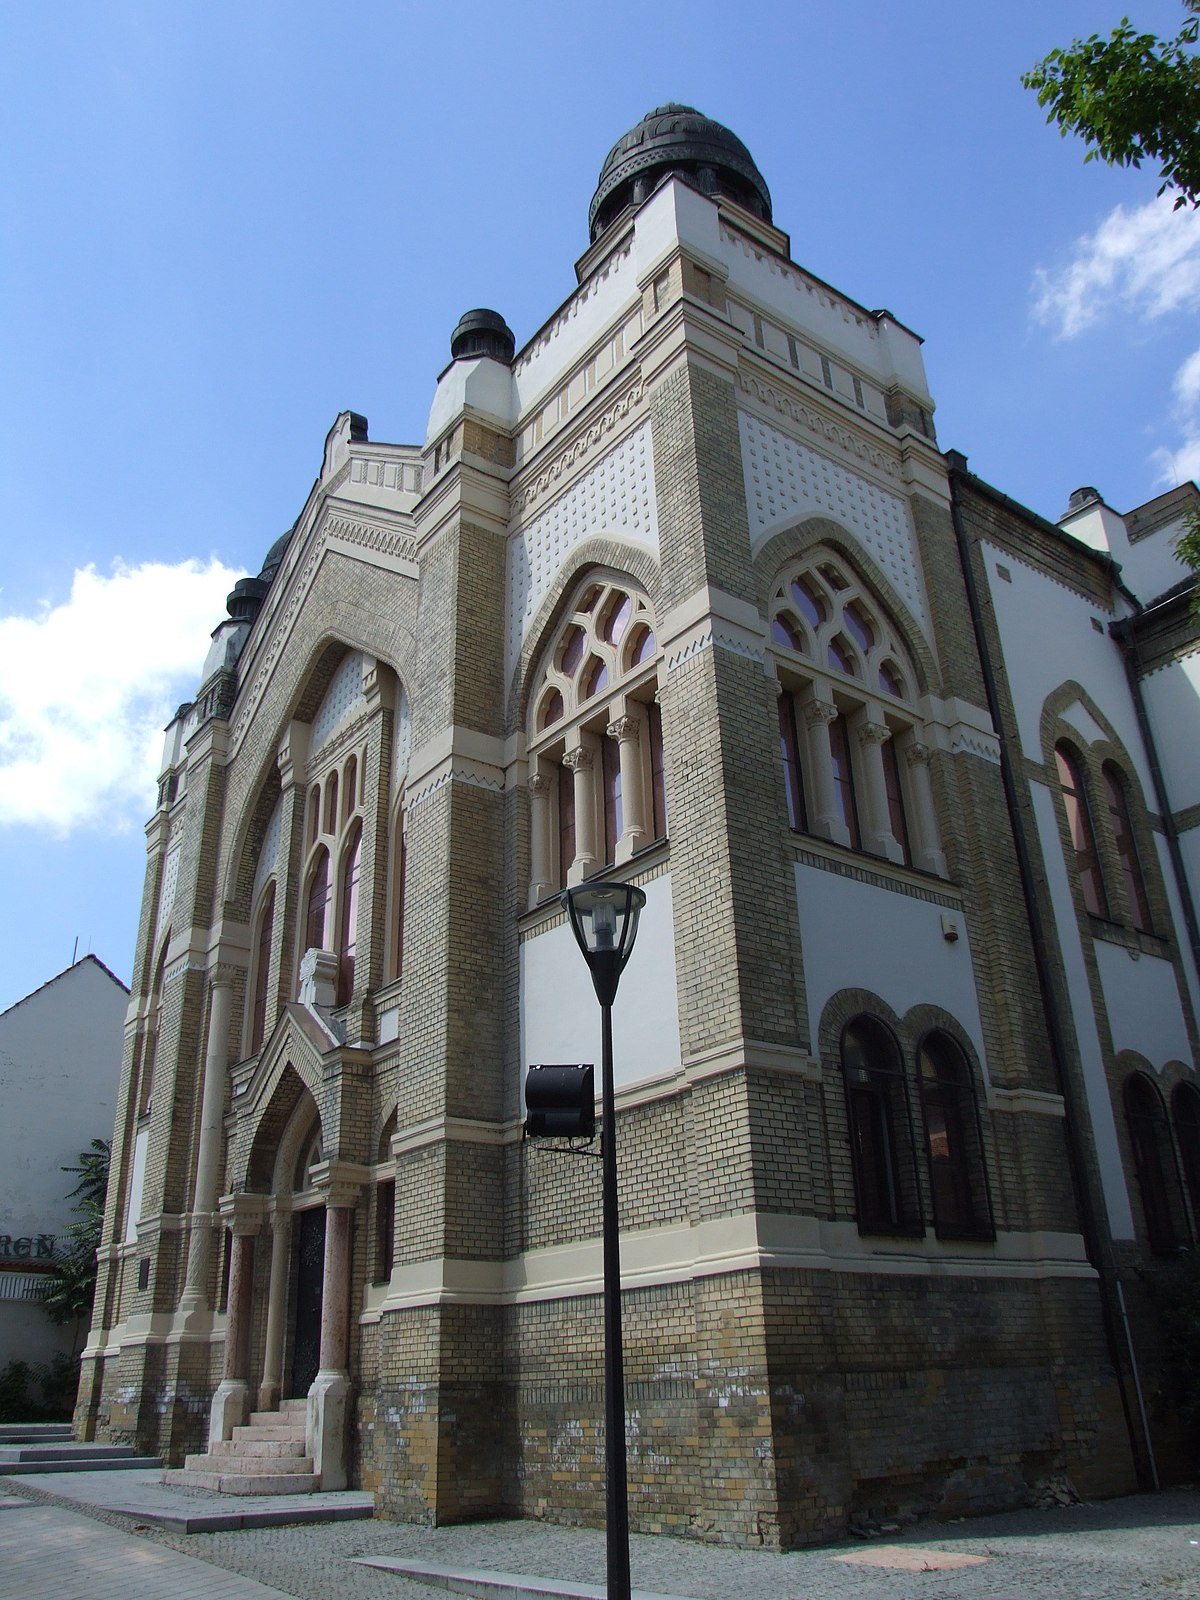 Slovakia Church and Synagogue Books, 1592-1910; pal:/MM9.3.1